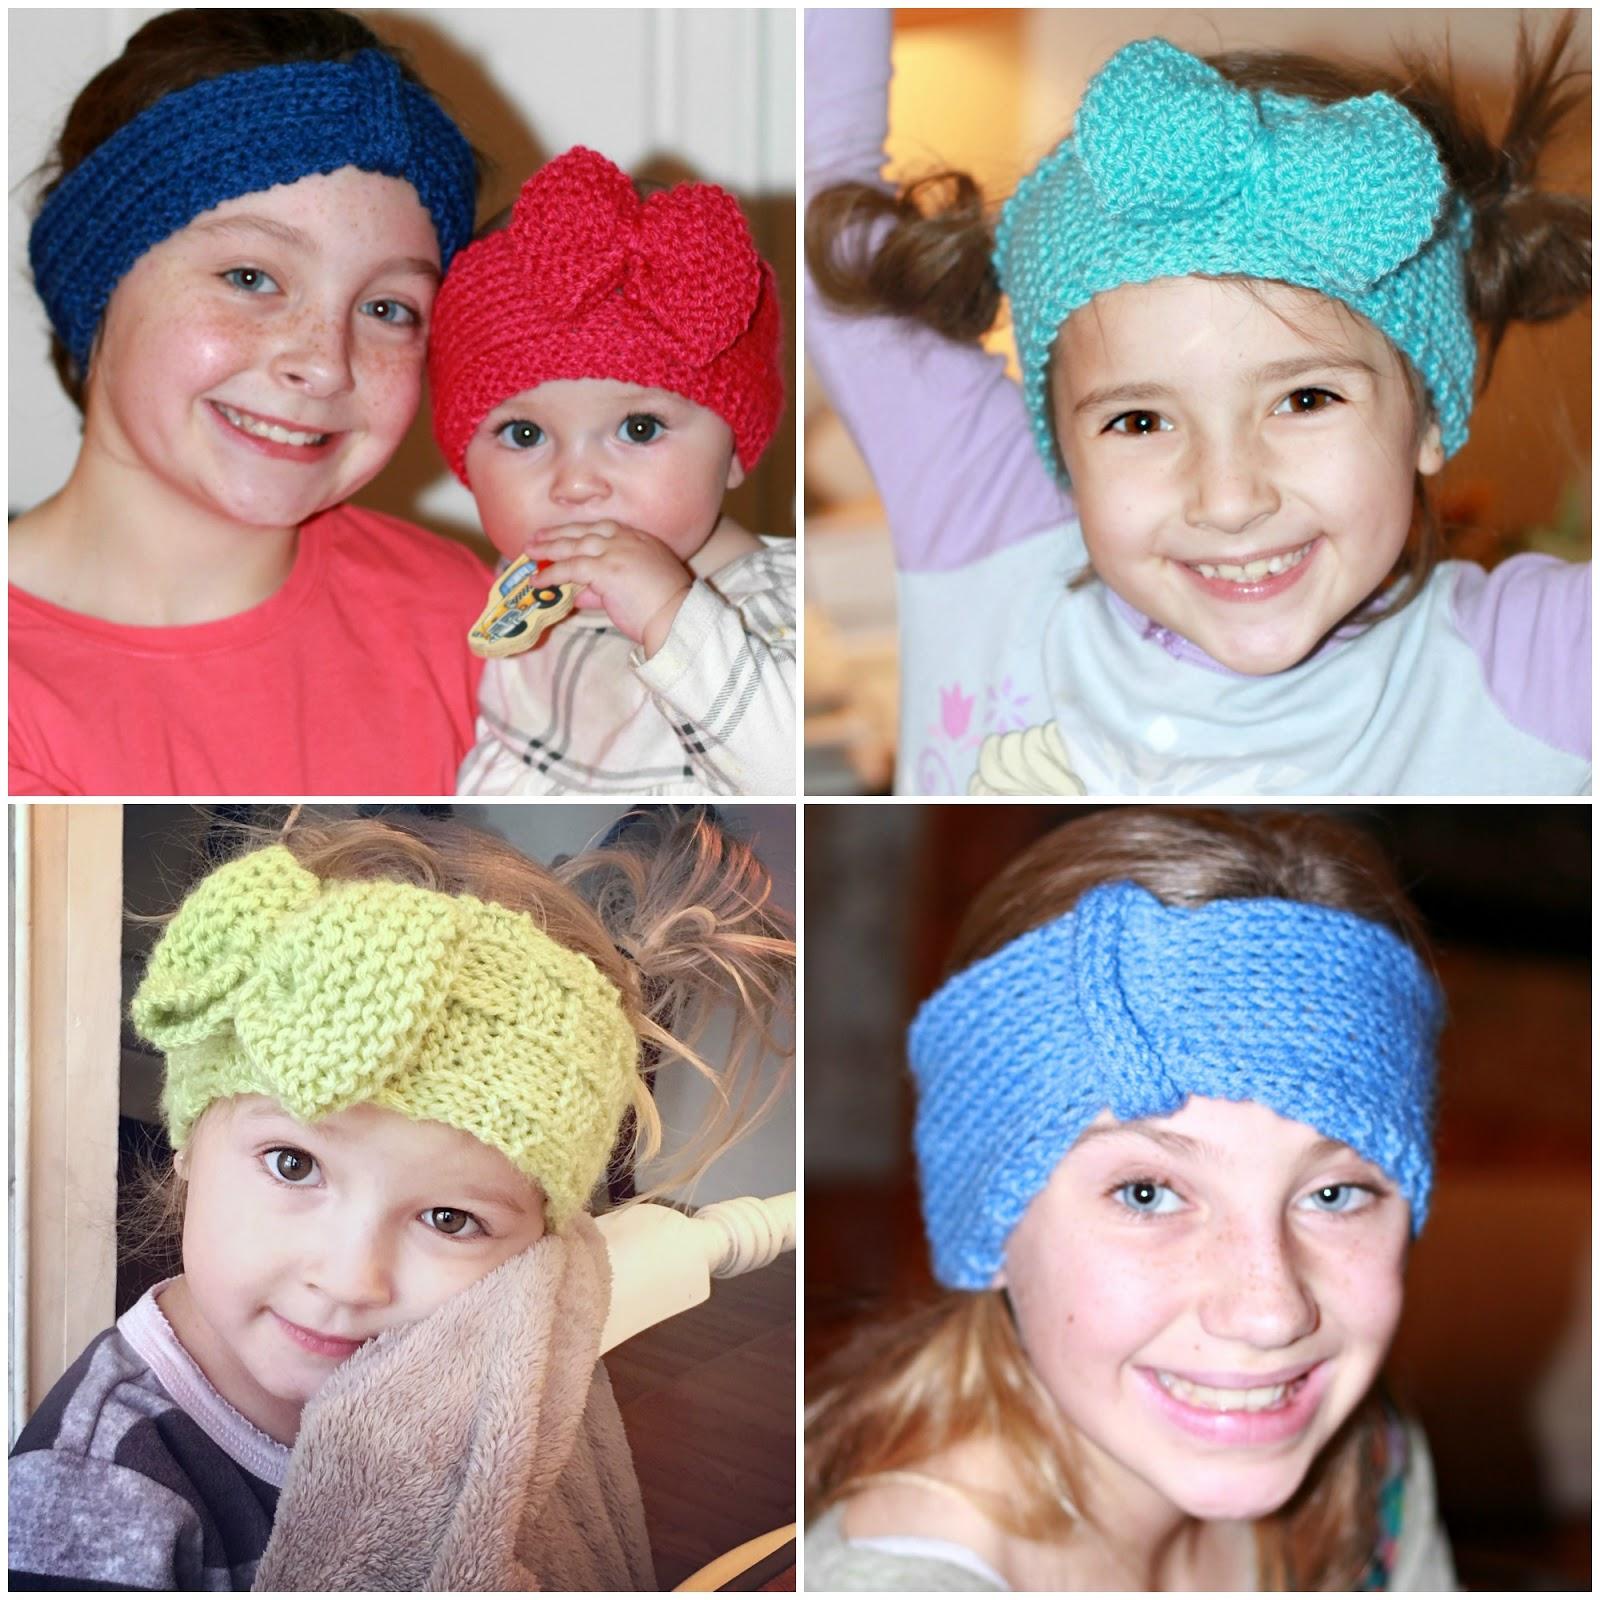 Knitted Headbands and Ear Warmers | Grateful Prayer | Thankful Heart